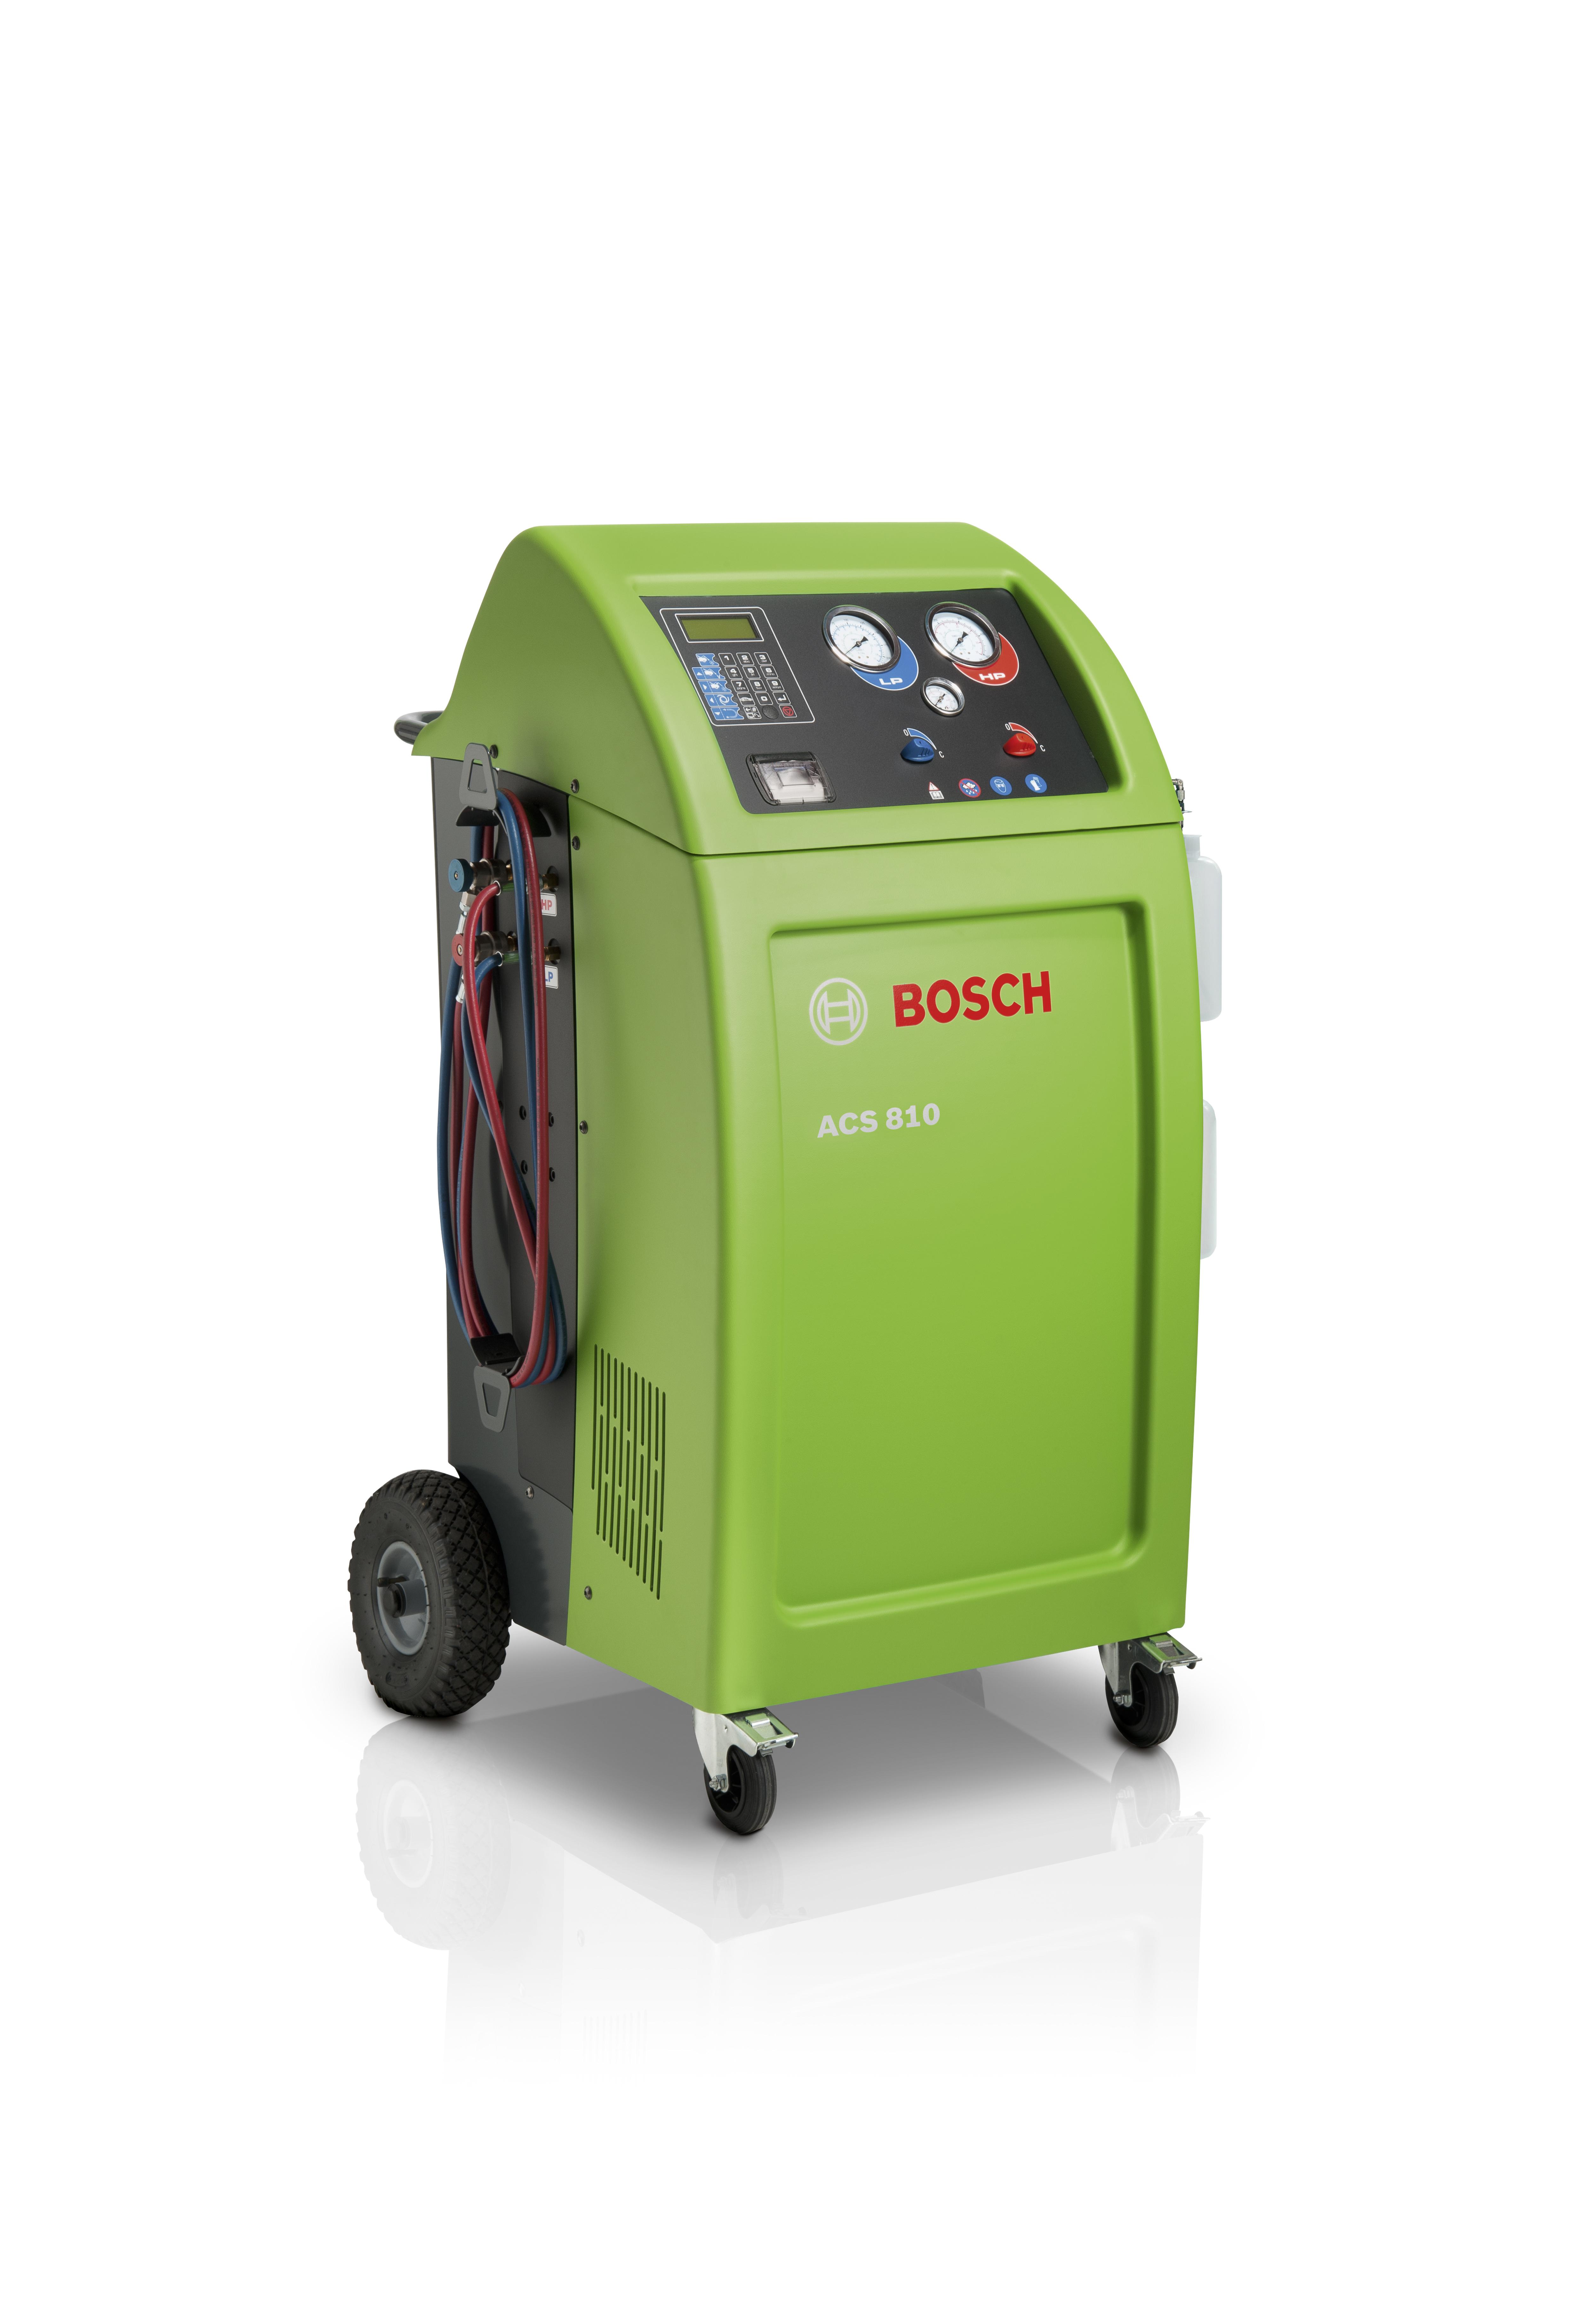 Recicladora de ar-condicionado ACS 810